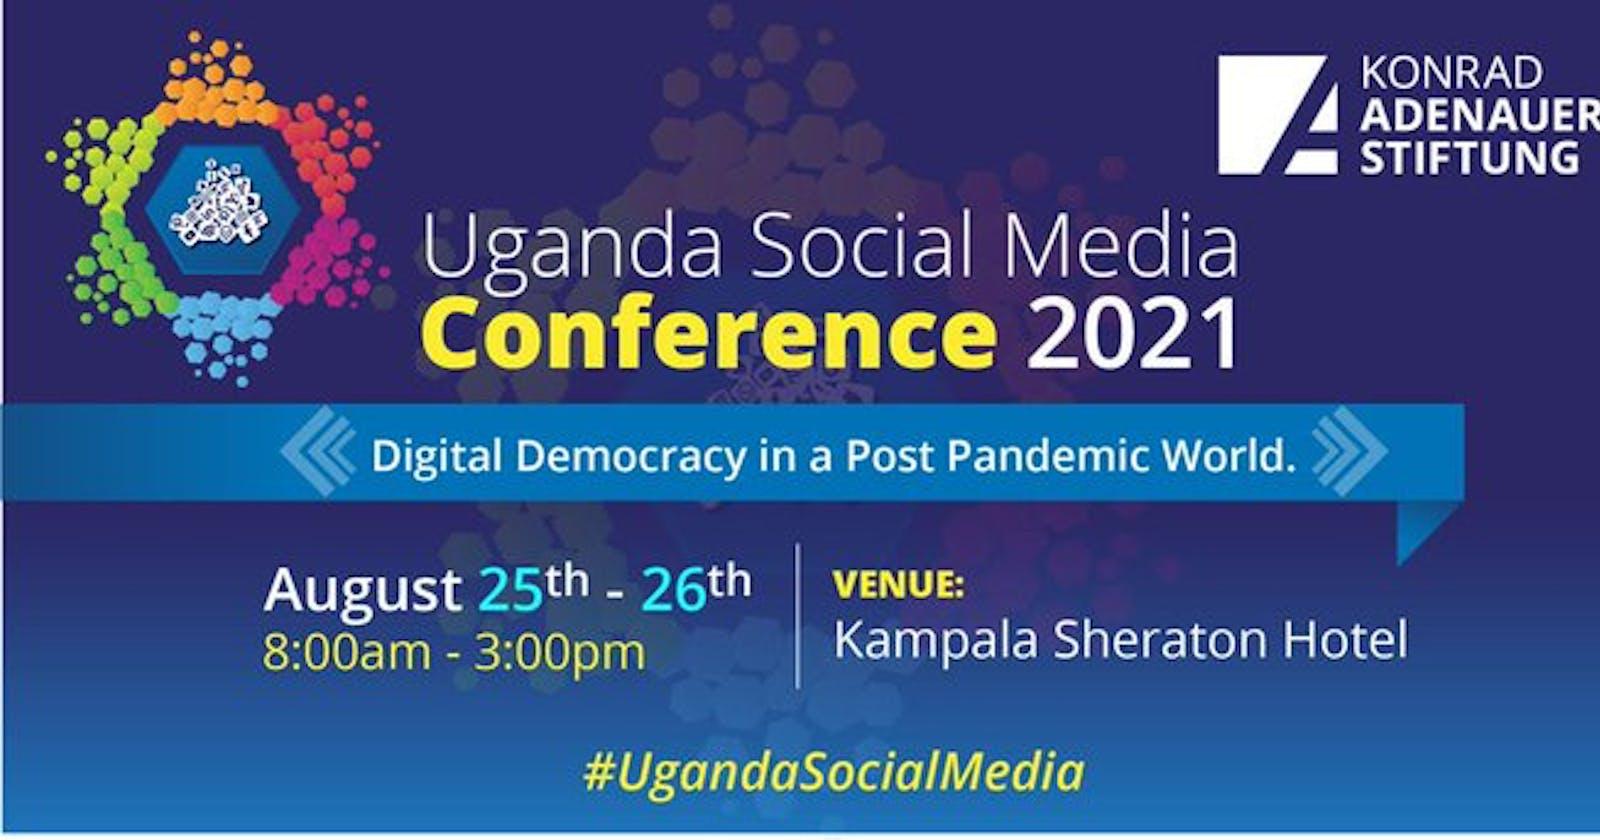 Two days to Uganda Social Media Conference!